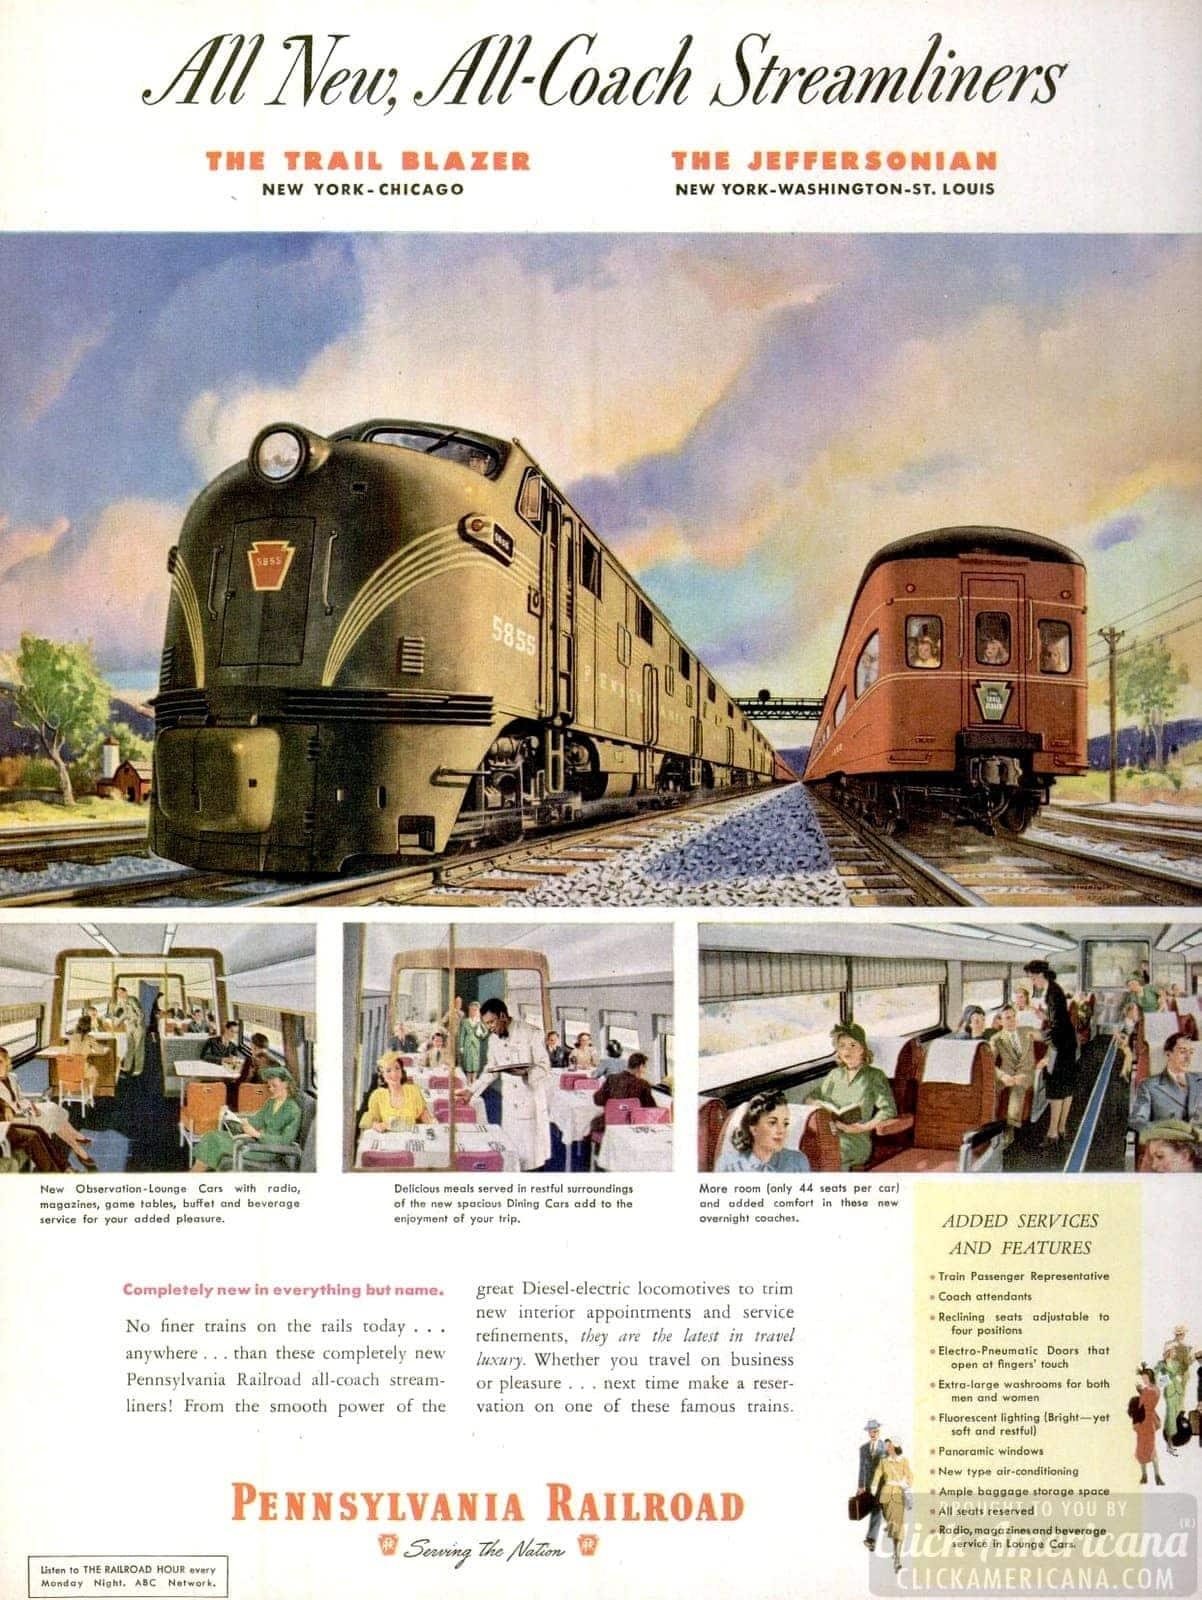 Railroads of 1949 - New all-coach streamliner trains